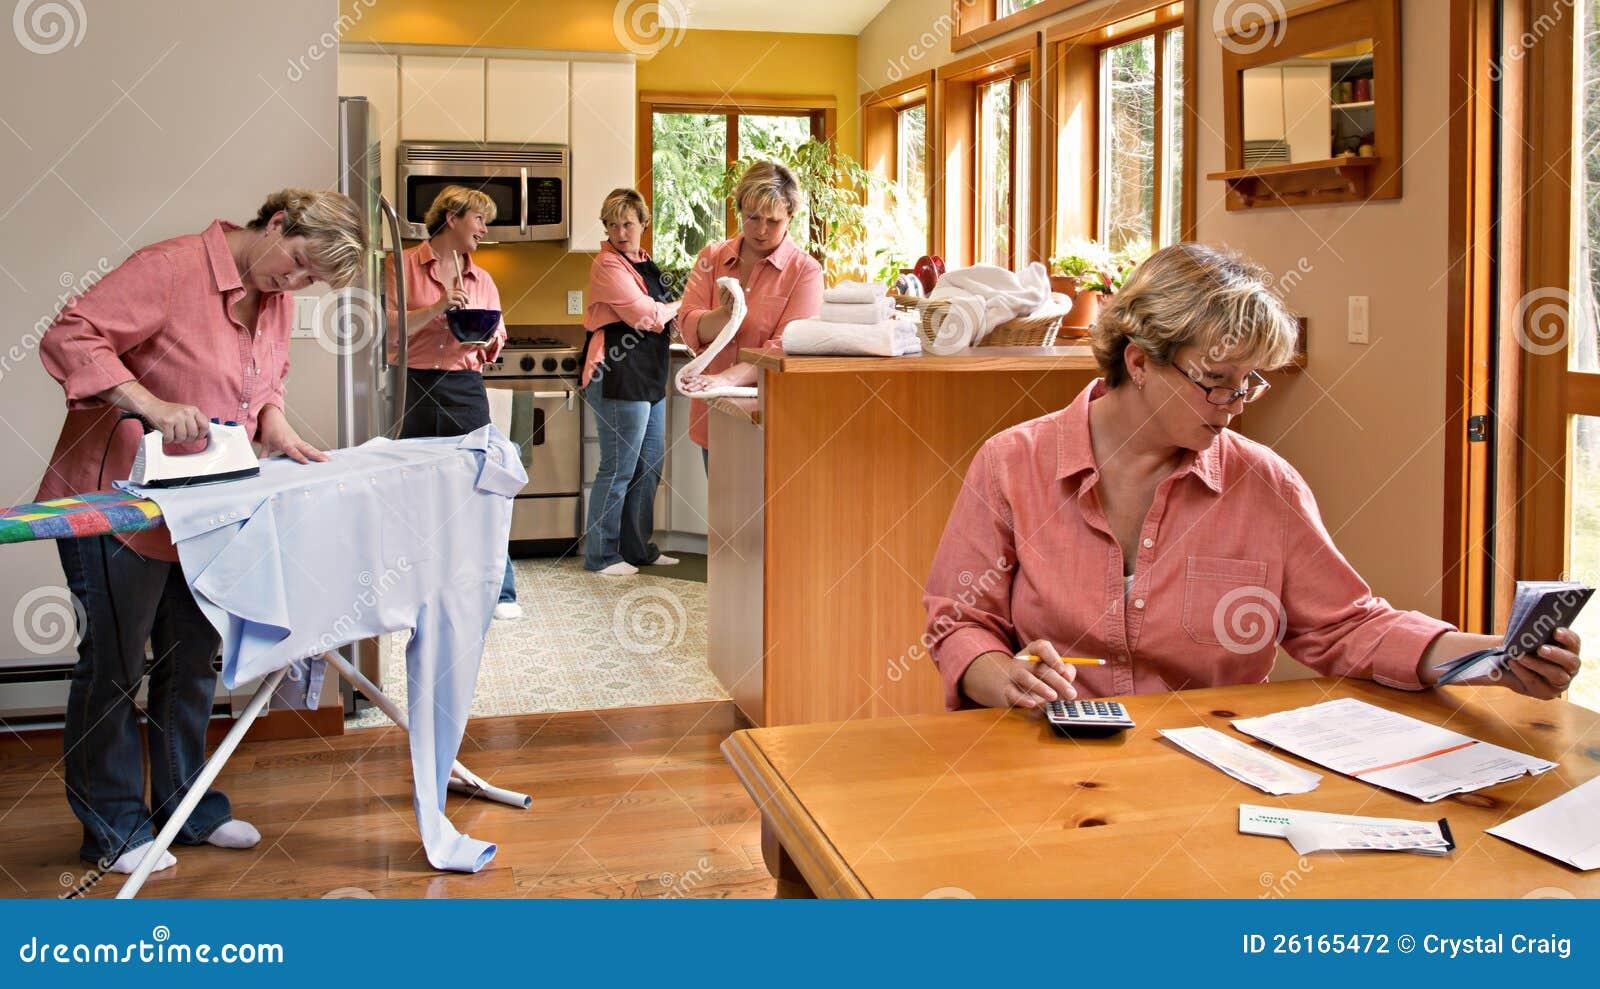 Multi-tasking Karweien van het Huishouden